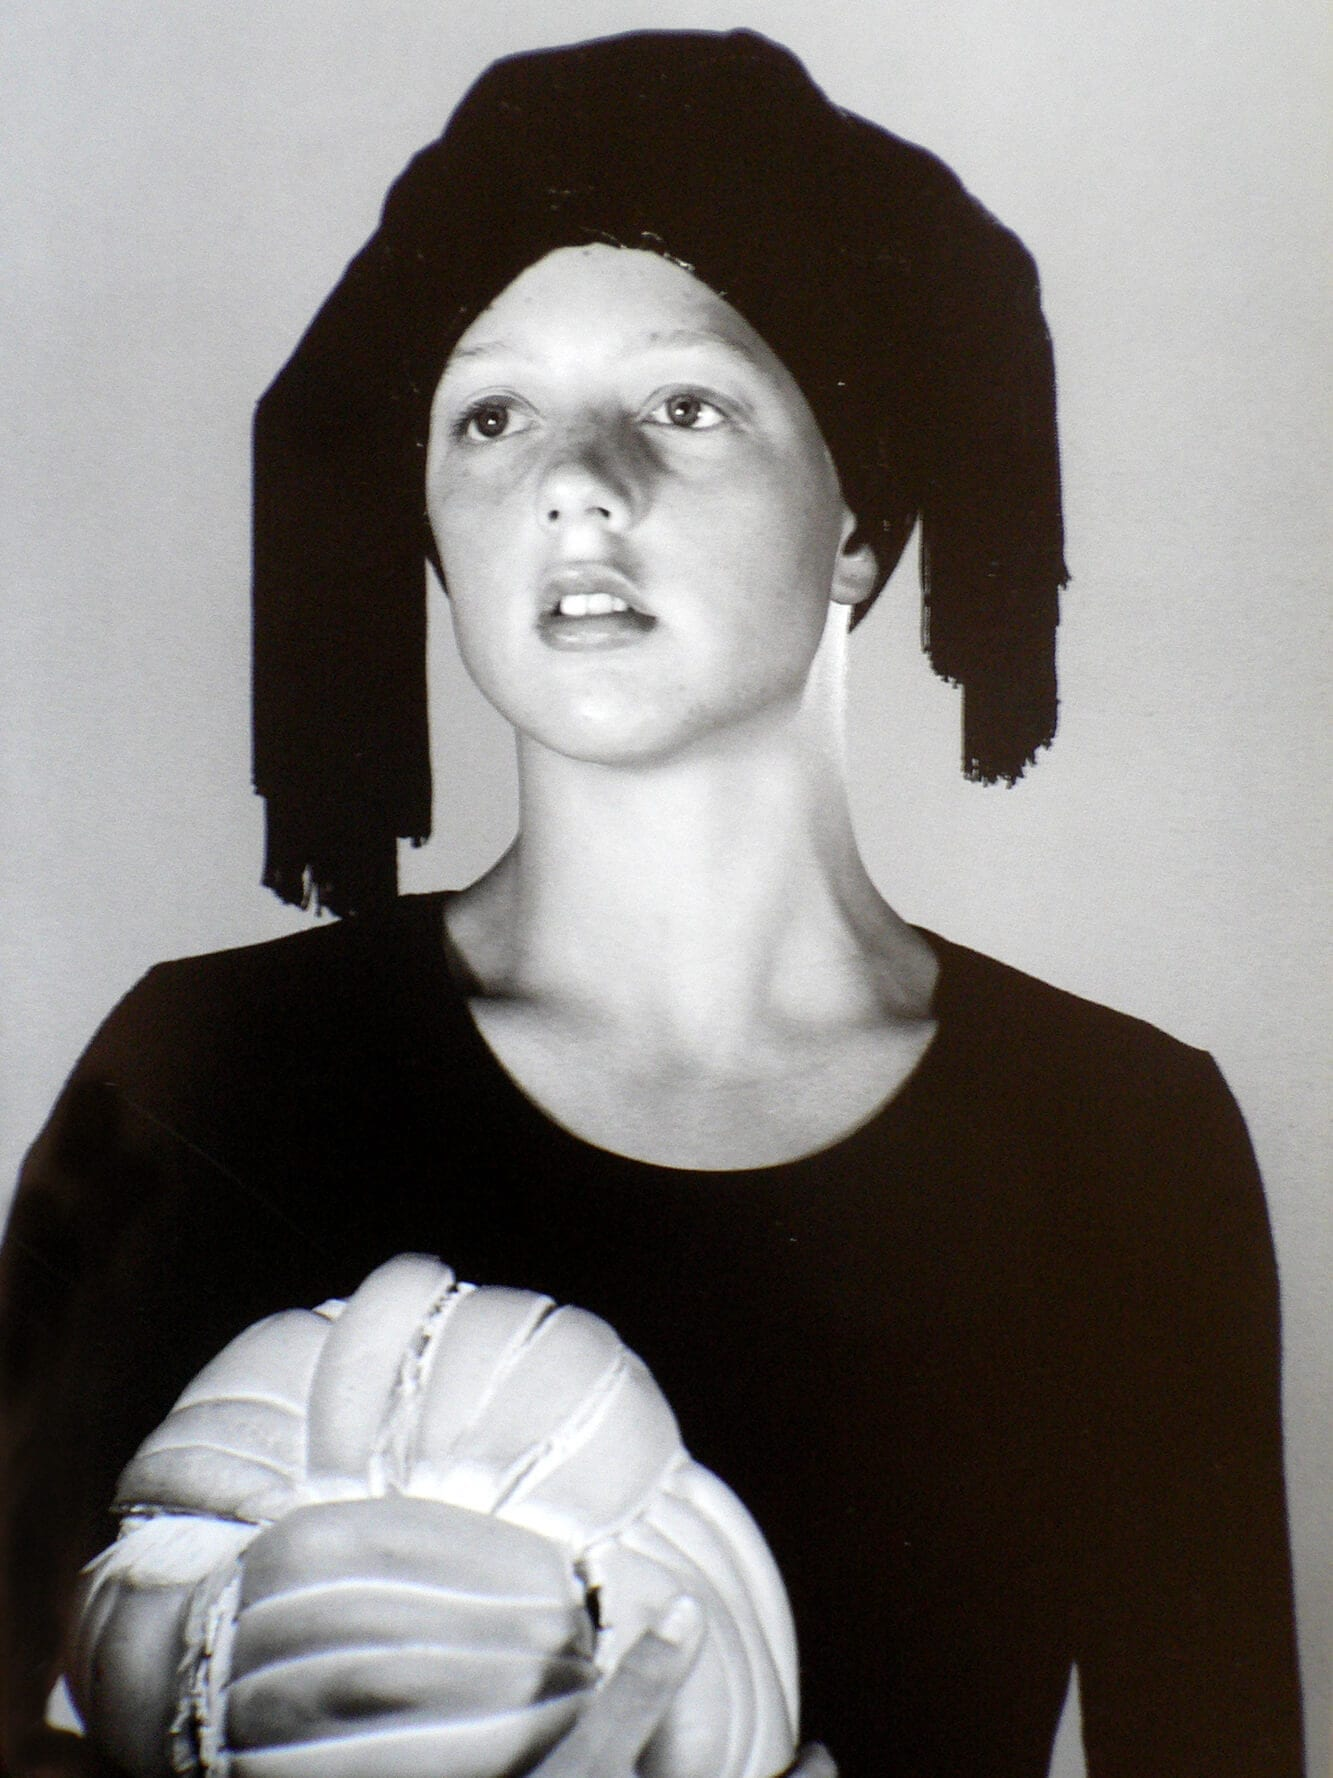 Eva Lootz, Pequeño teatro de derivas. Without love no revolution, 1994